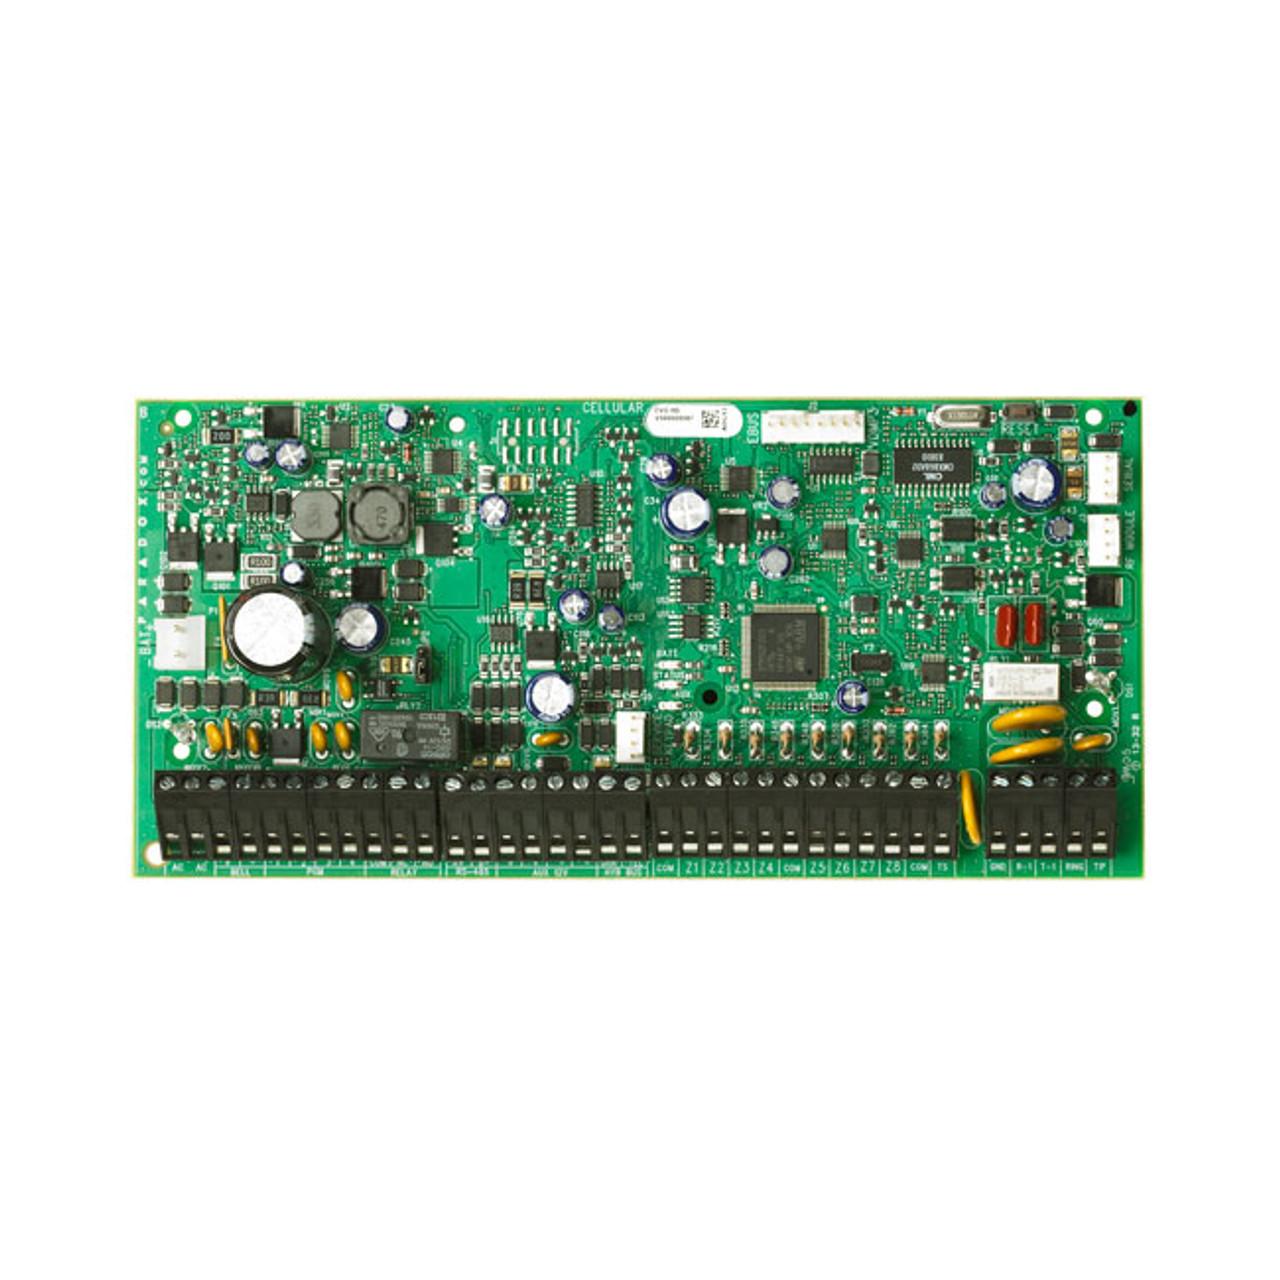 Paradox mg5050 32 zone wireless alarm panel tremtech electrical paradox mg5050 pcb cheapraybanclubmaster Choice Image